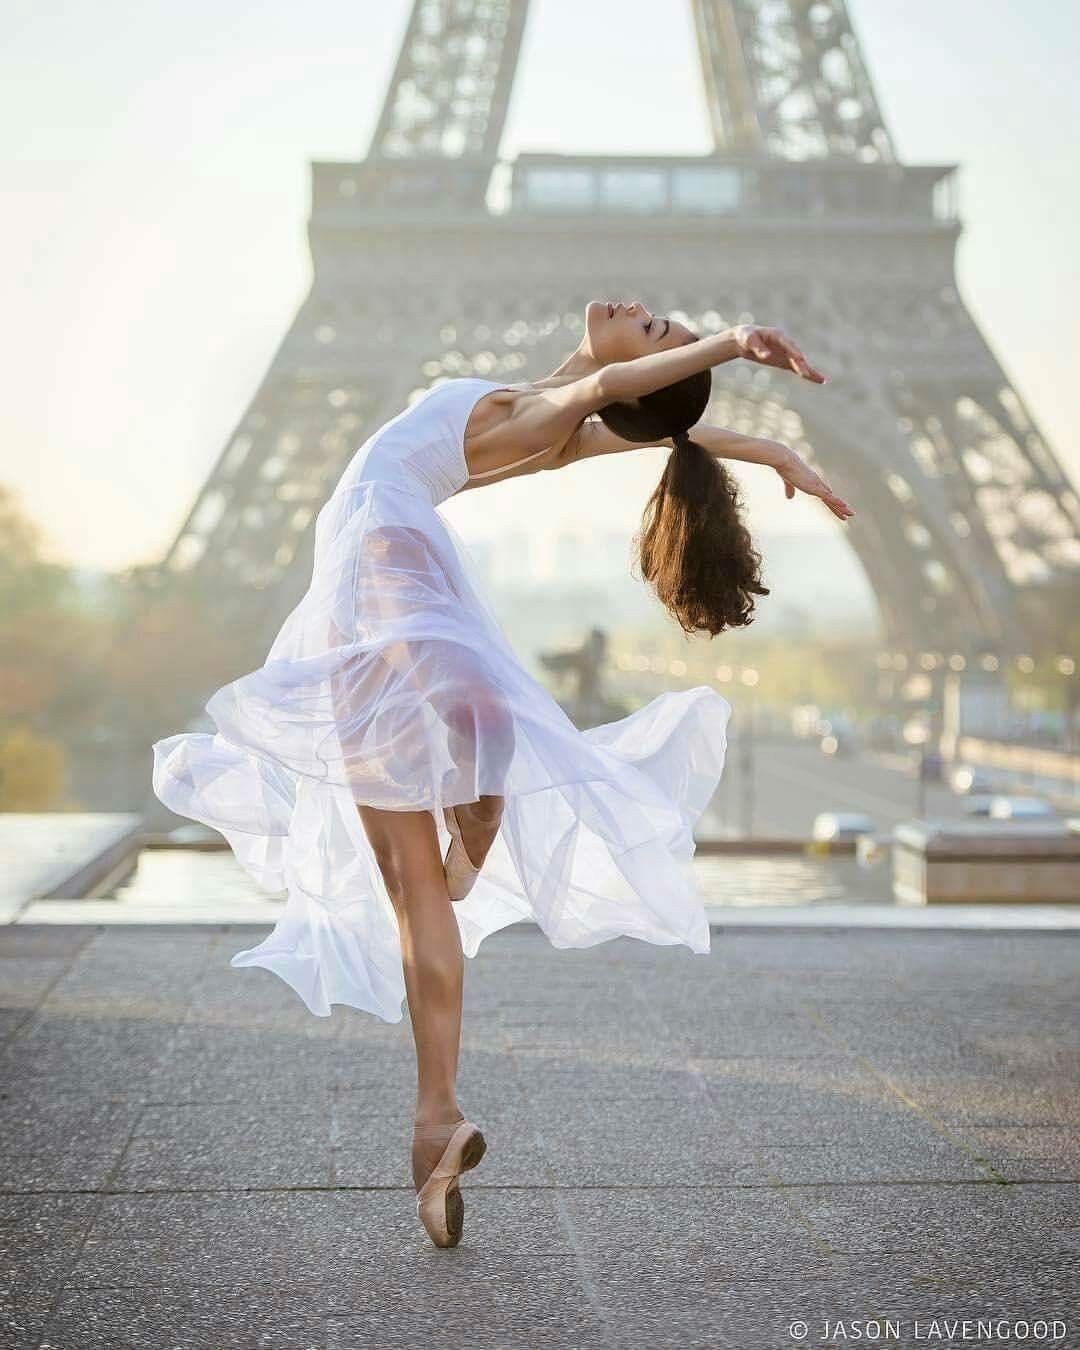 World Pole Dance   Pole dancing, Dance, Poses